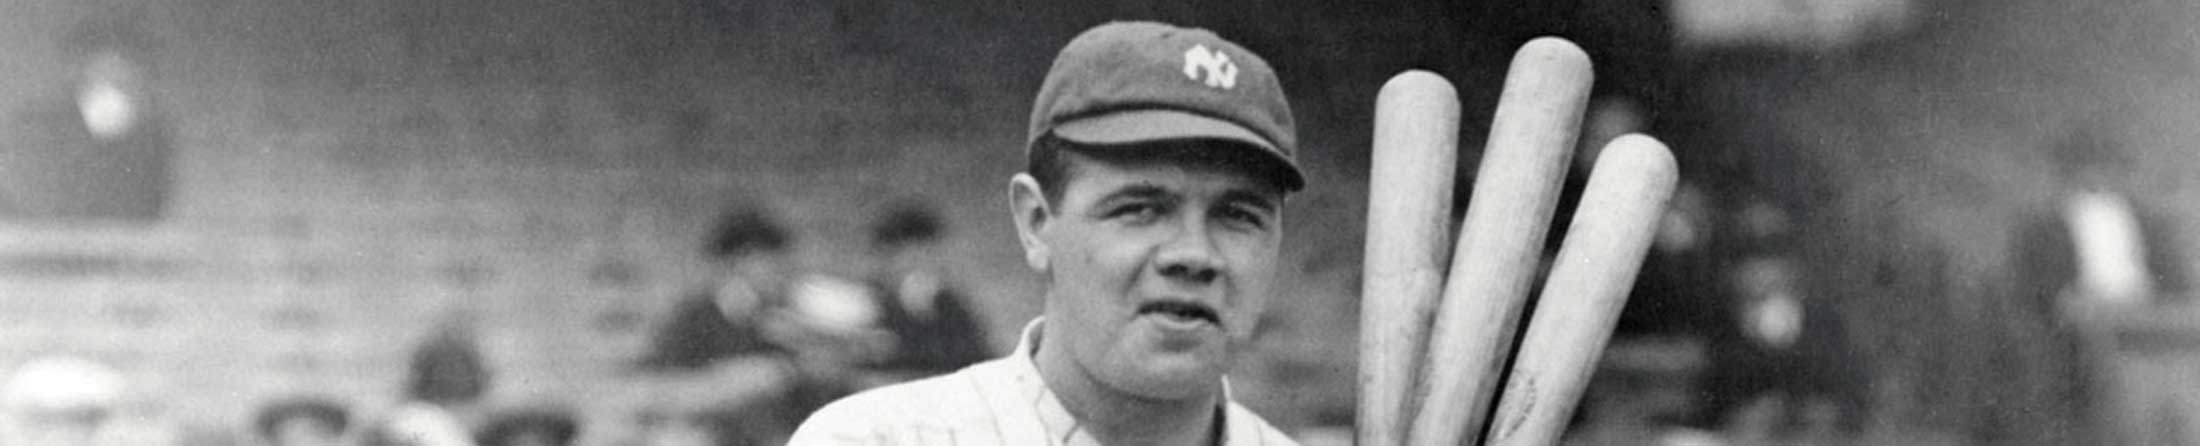 Babe Ruth - header